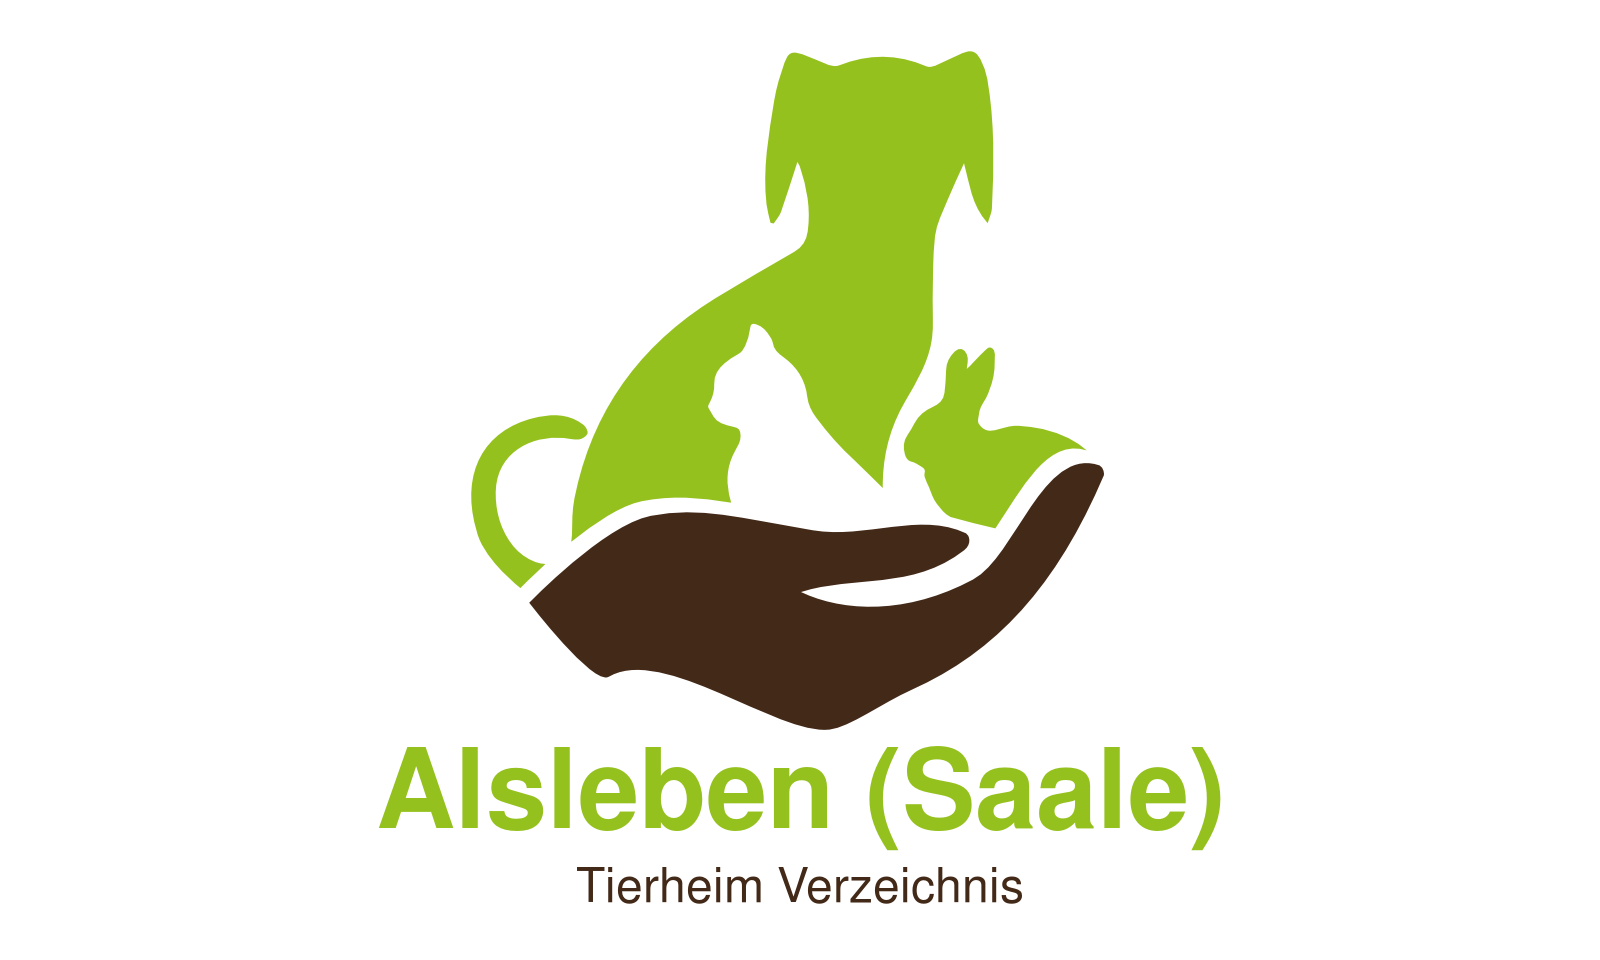 Tierheim Alsleben (Saale)